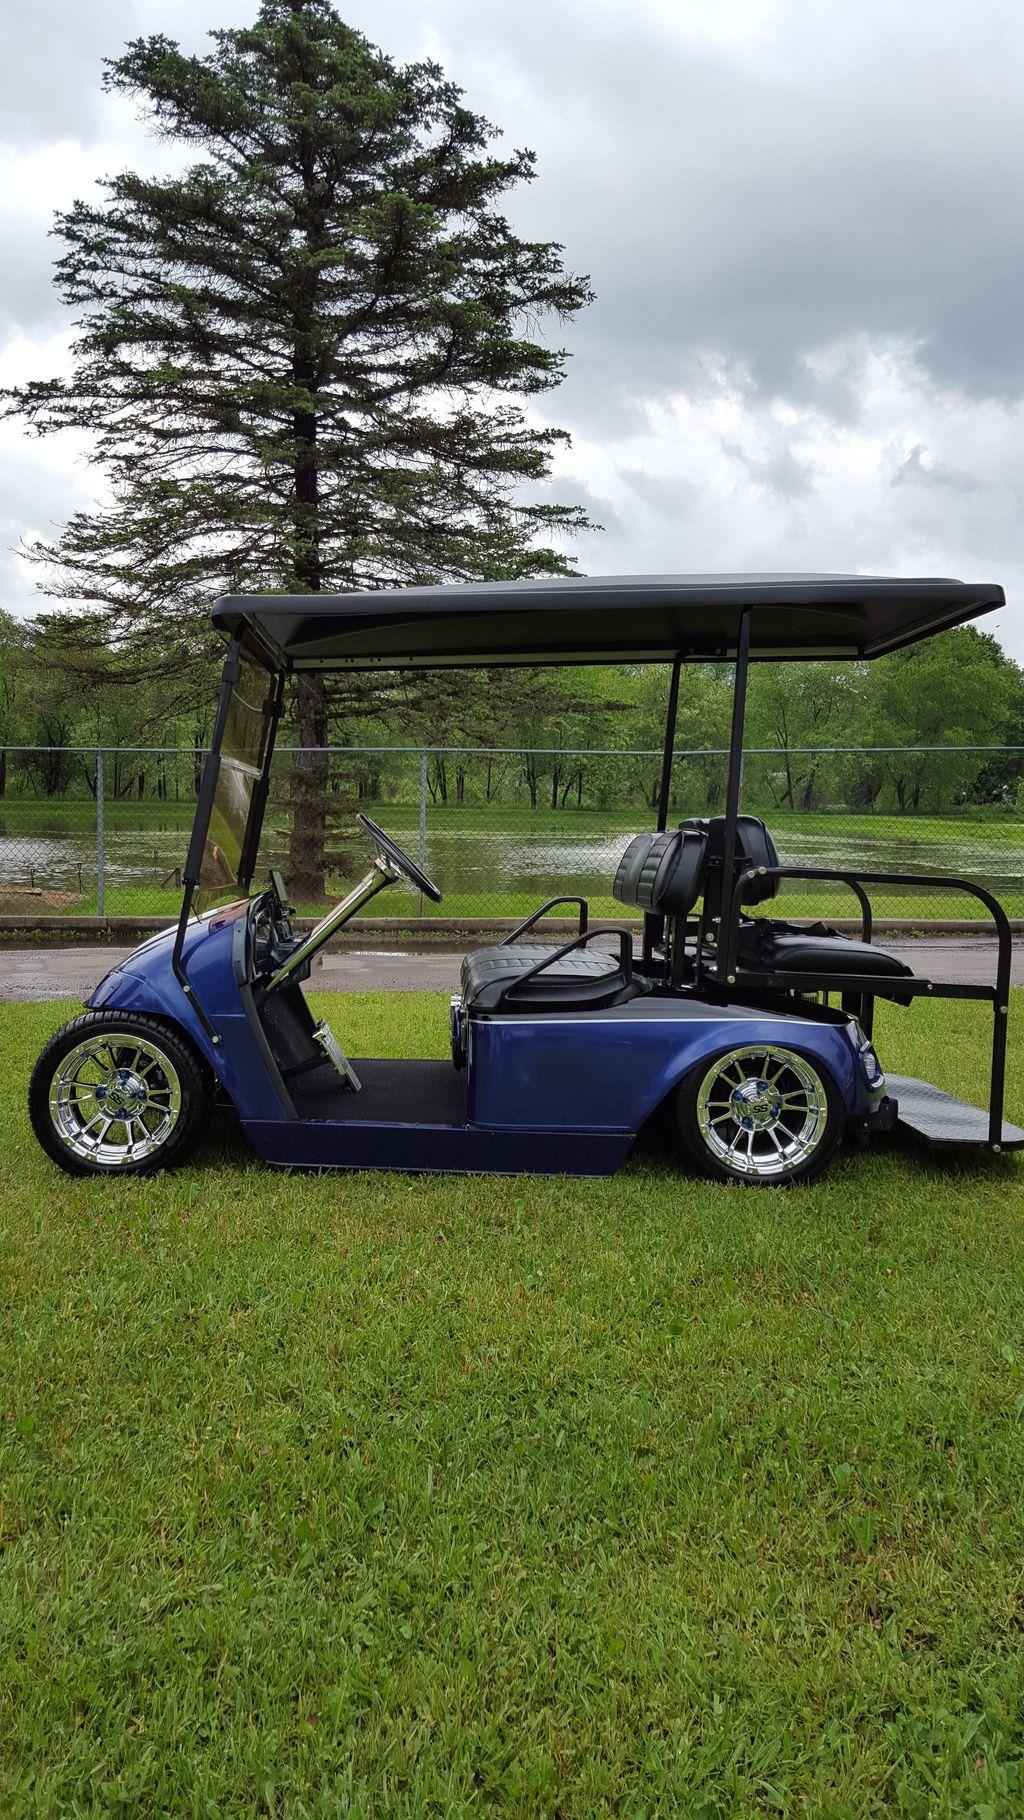 06' EZGO build- Air Ride, custom dash, Tv, and much more ... Ezgo Golf Cart Dash Accessories on jake's golf cart accessories, yamaha golf cart accessories, aftermarket golf cart accessories, ezgo lifted carts, e-z-go golf cart accessories, hunting golf cart accessories, wholesale golf cart accessories, club car ds accessories, club cart dash accessories,